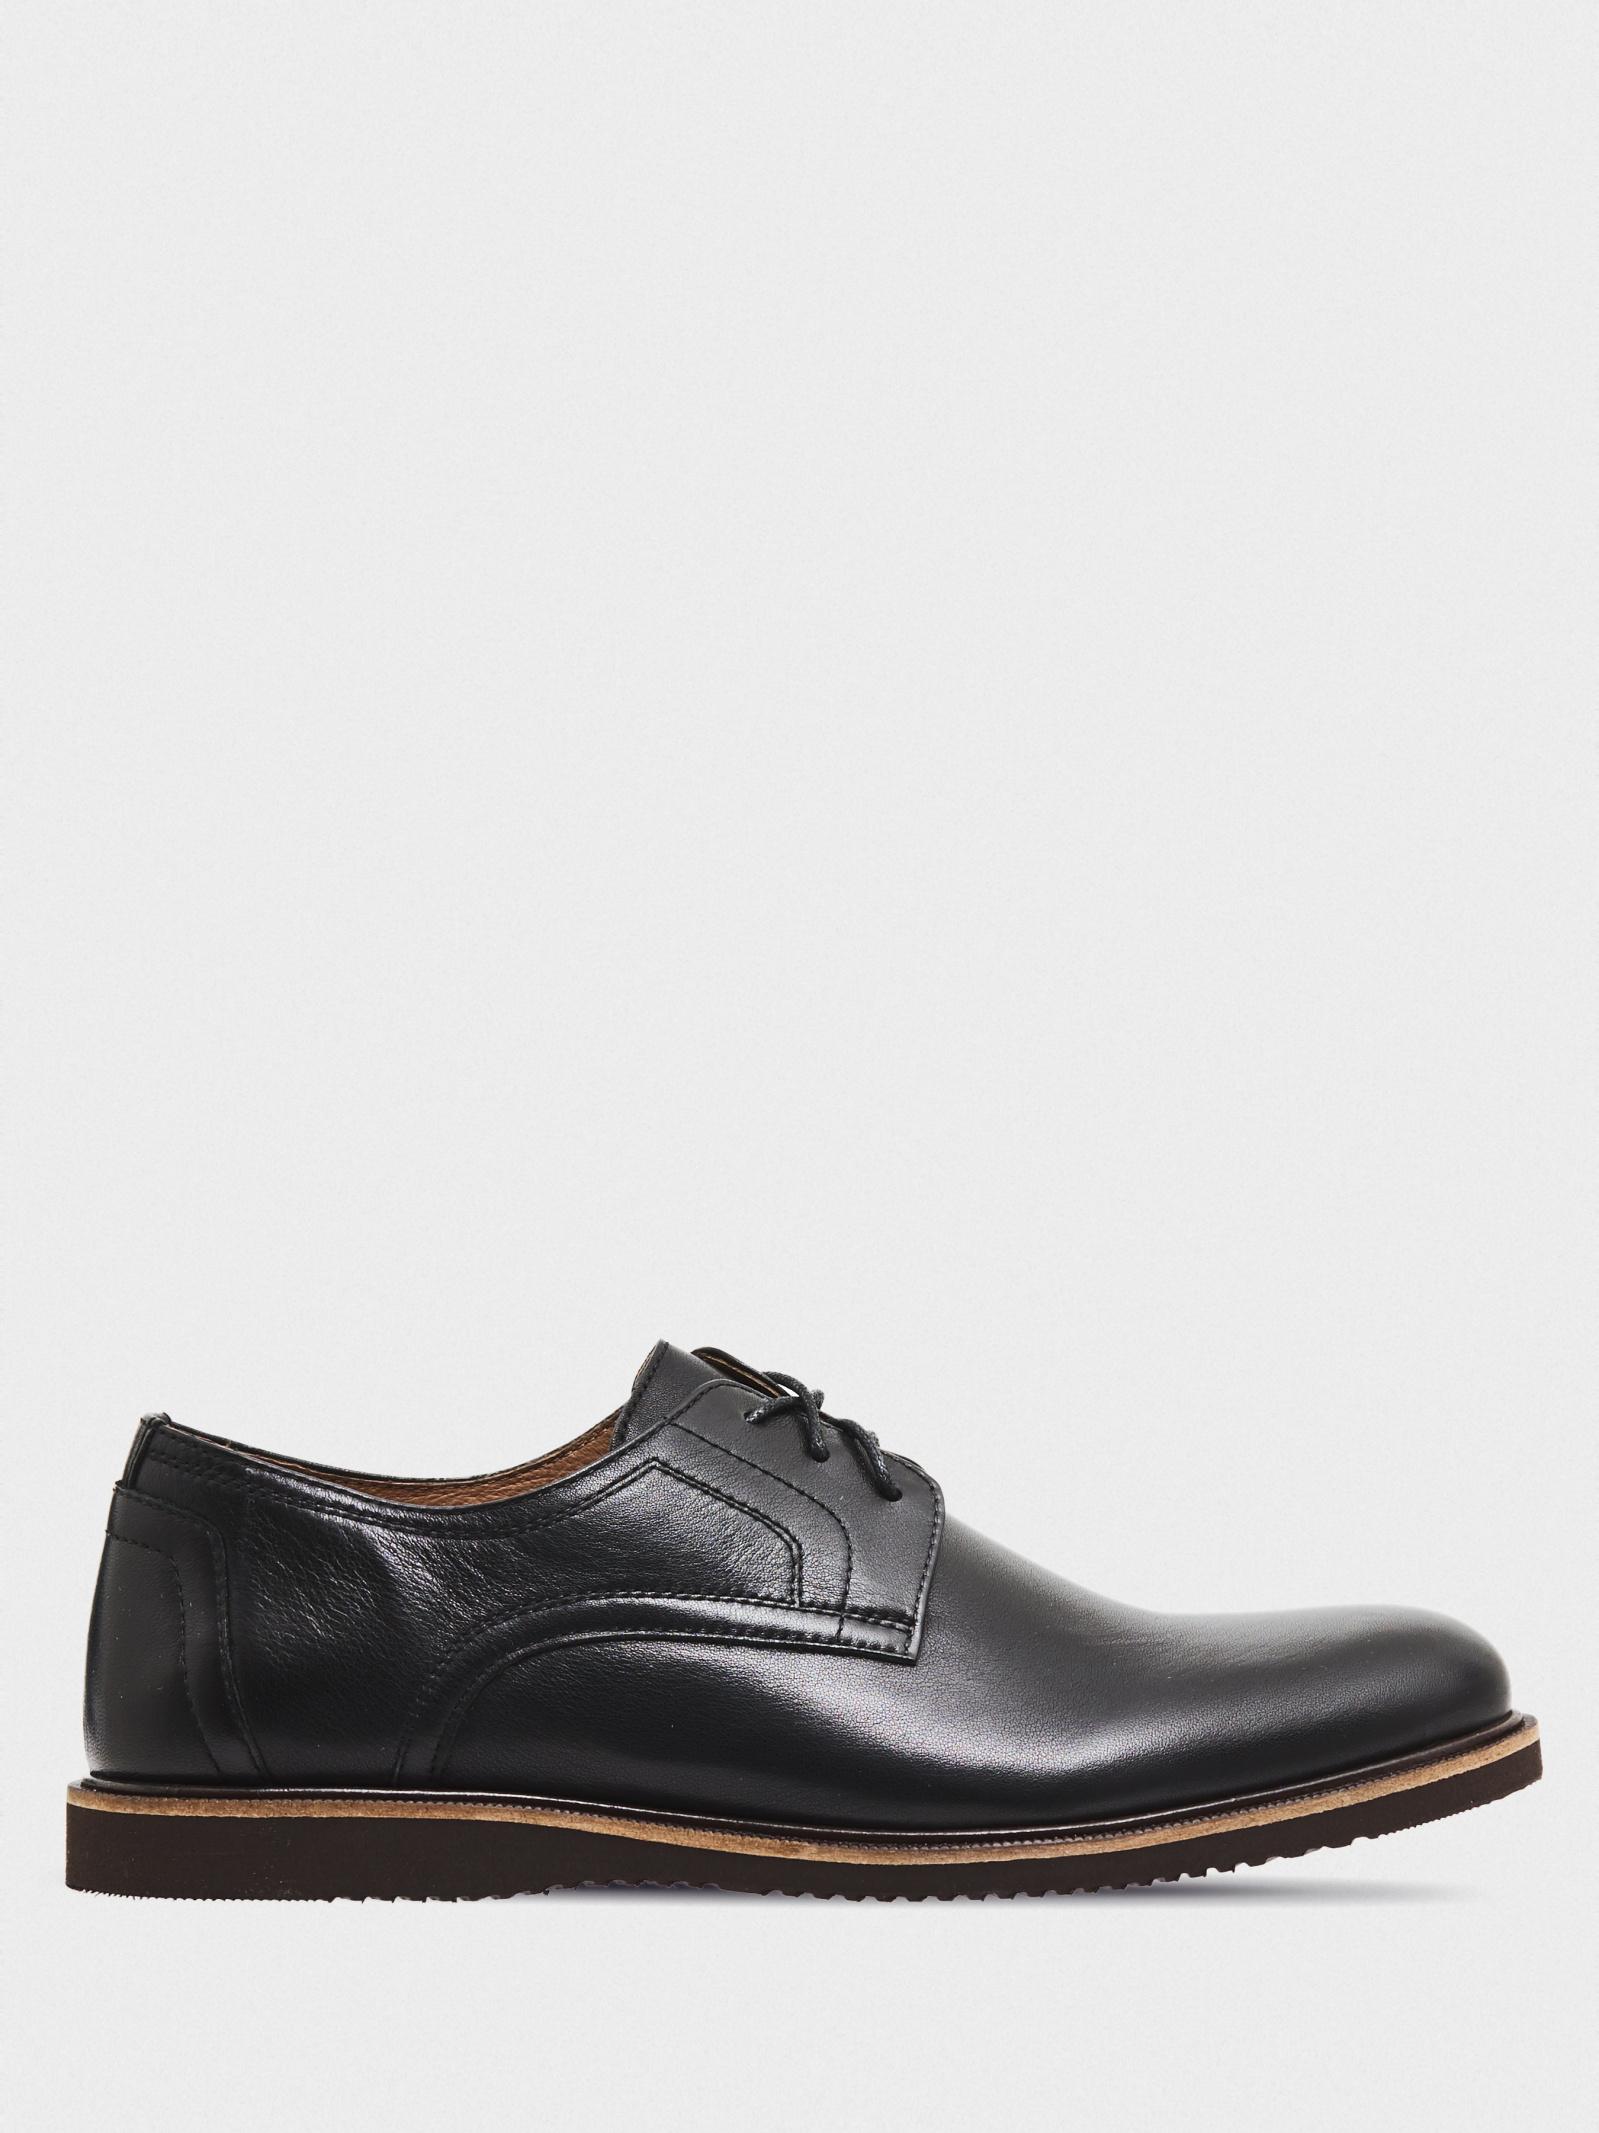 Полуботинки для мужчин Braska 224-0077/101 размеры обуви, 2017